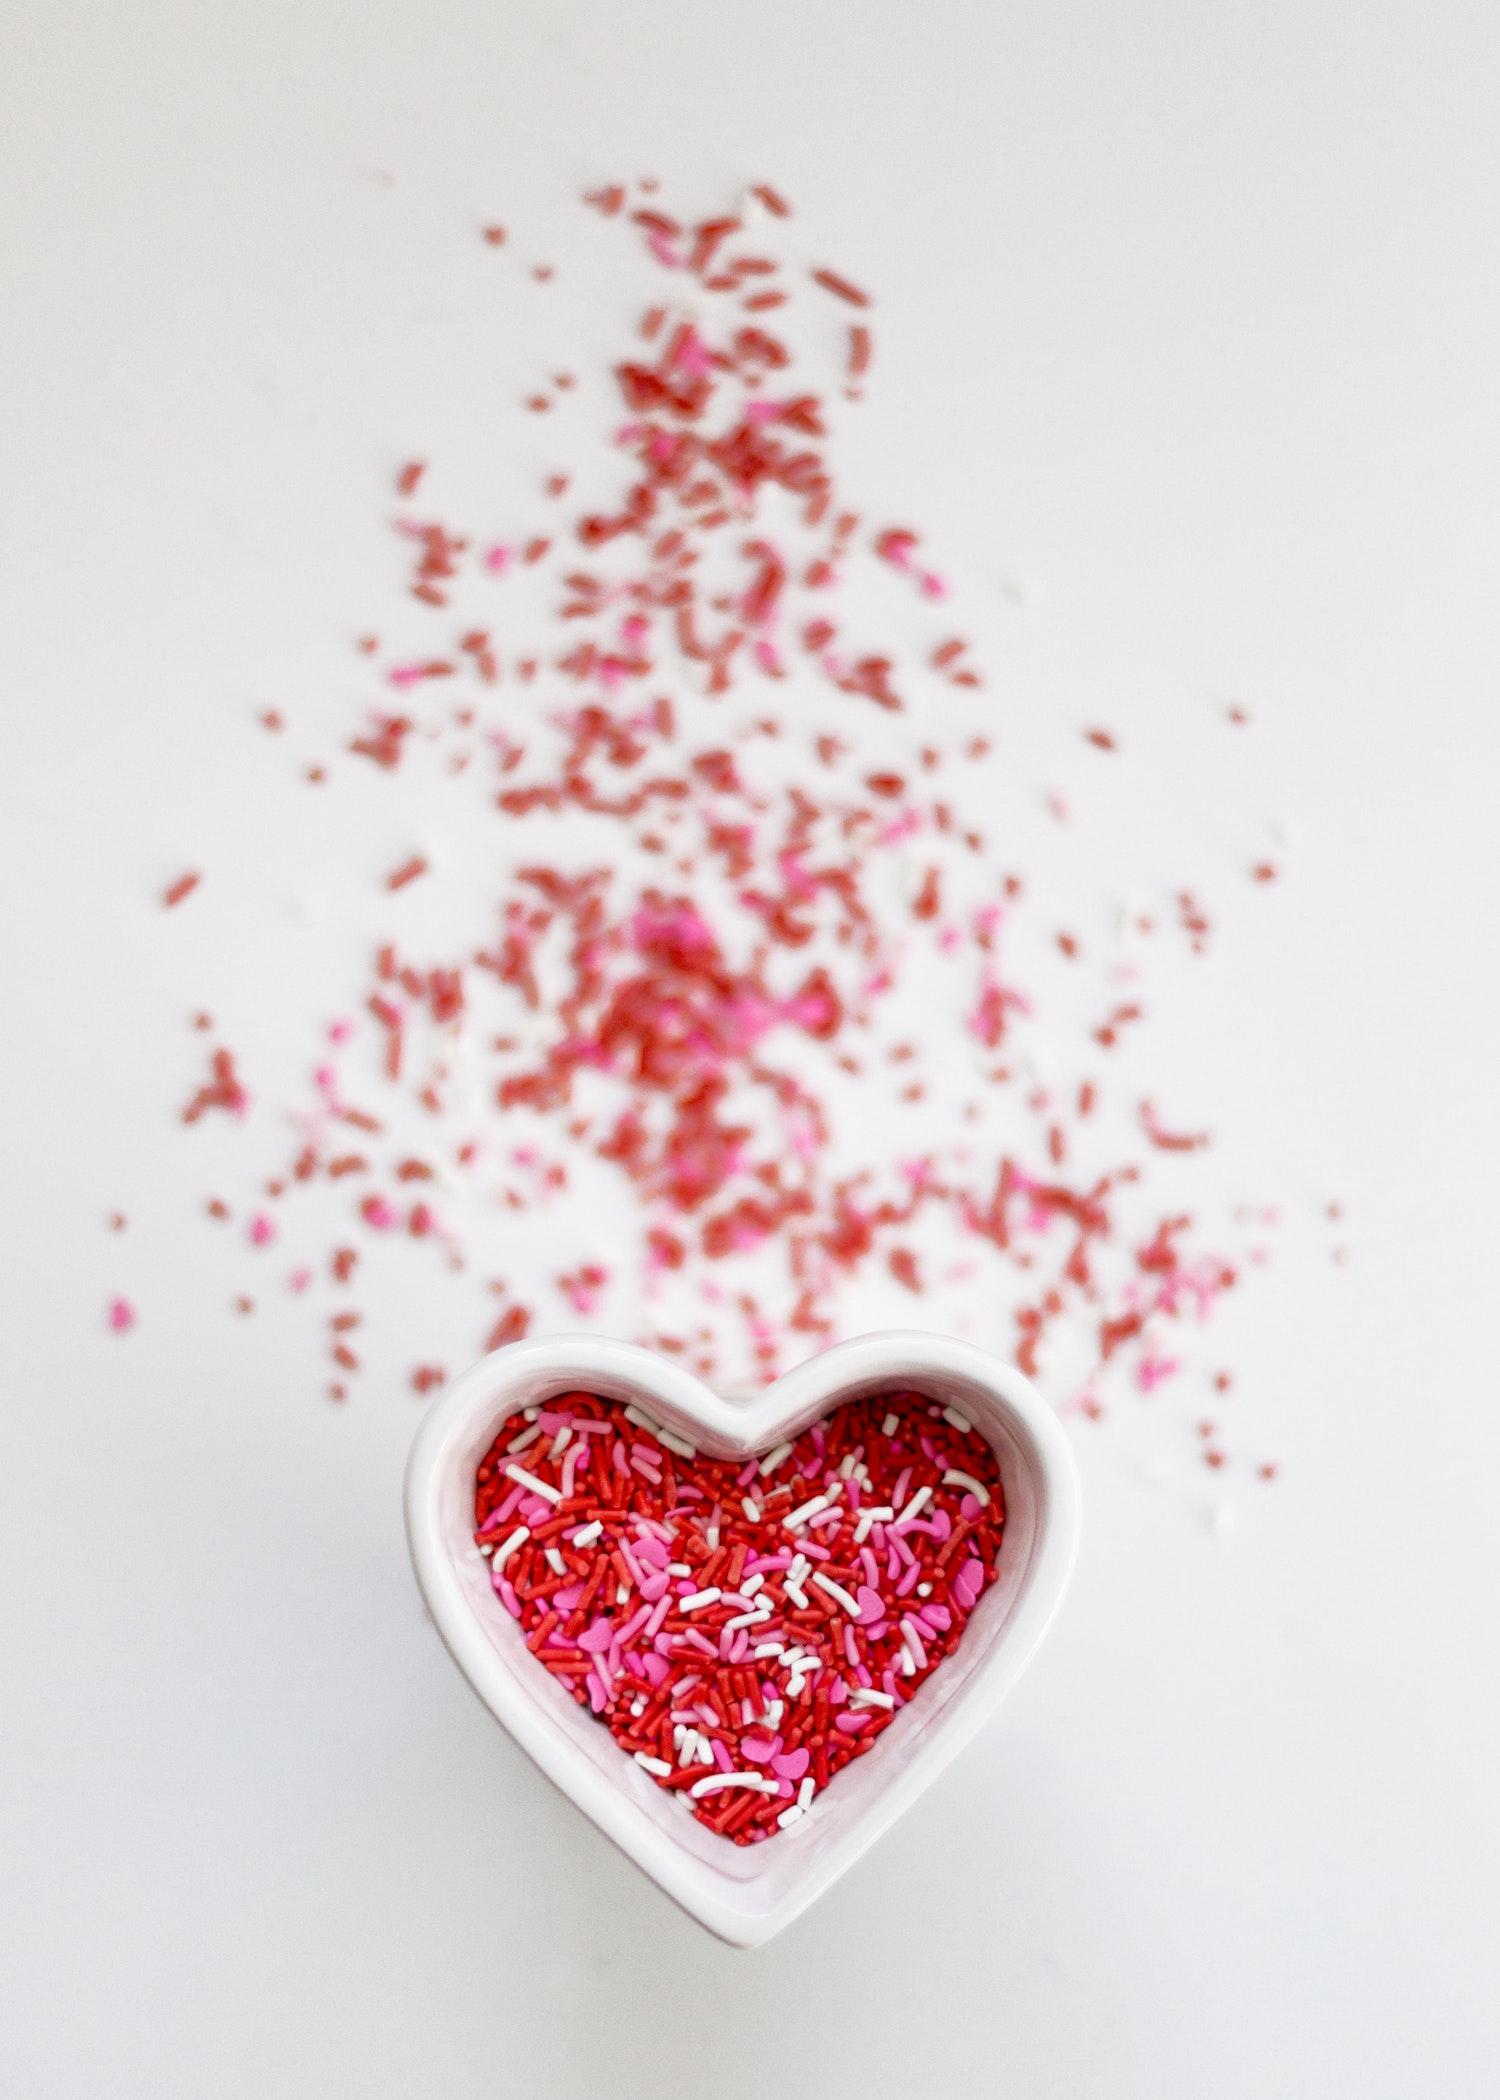 virtual valentine's day ideas